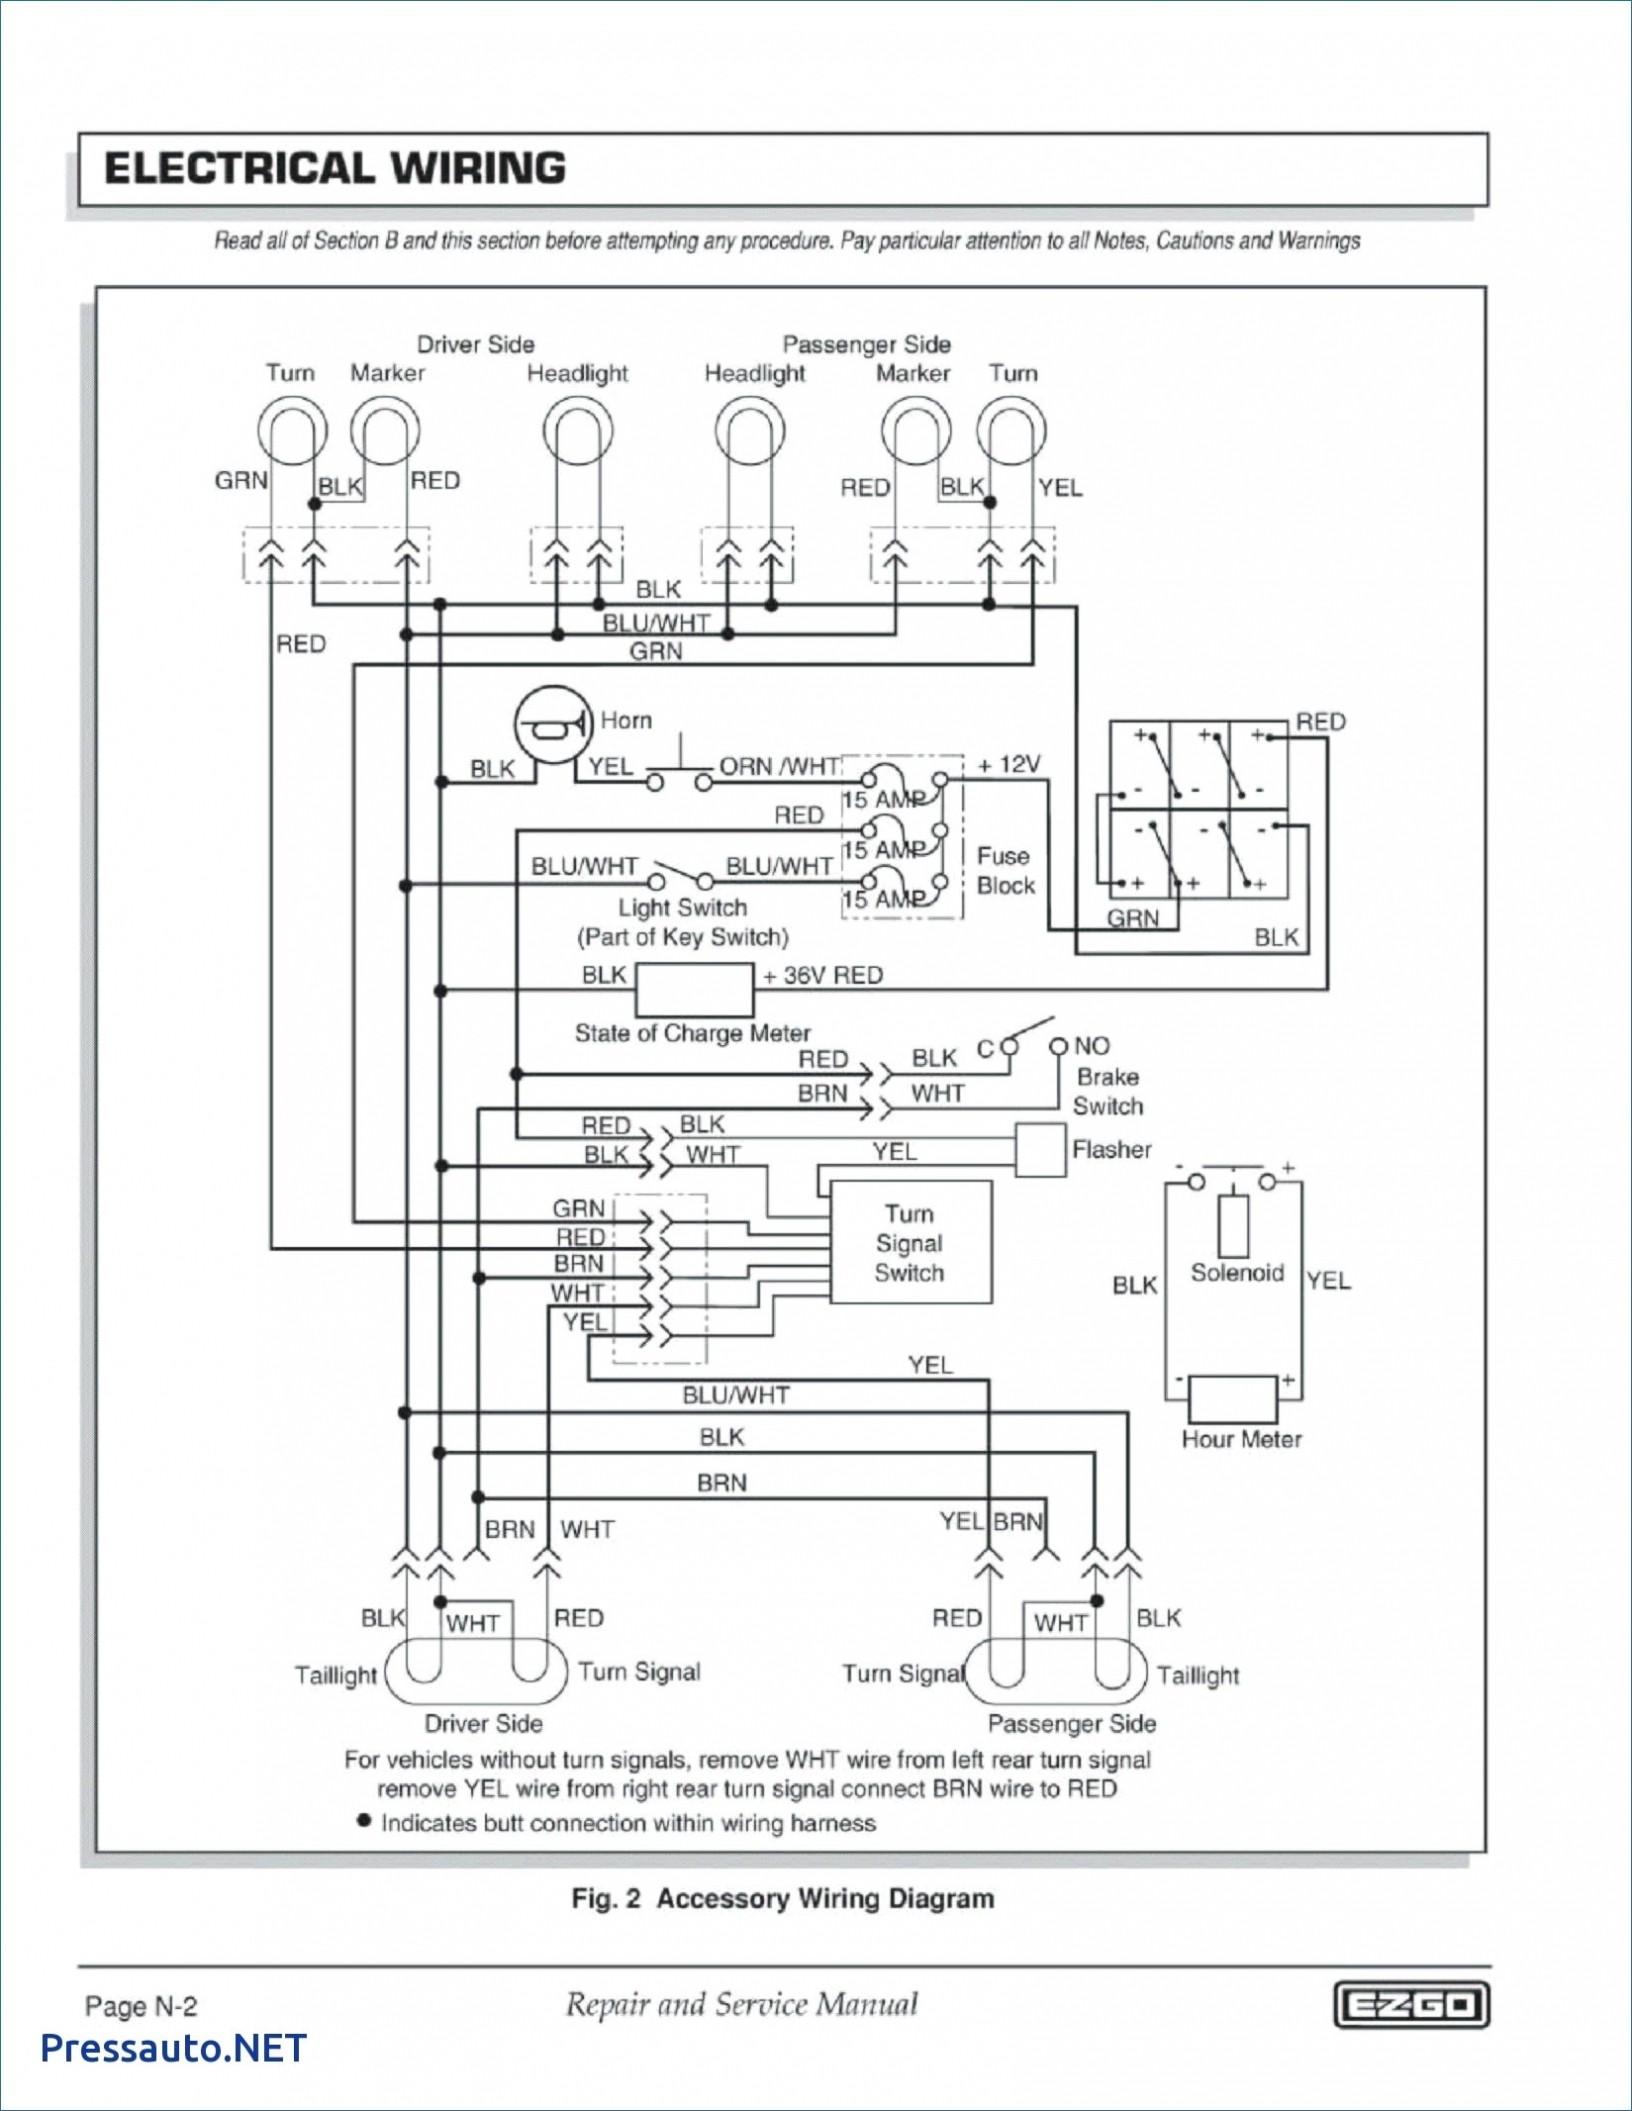 Ezgo Gas Golf Cart Wiring Diagram Vo 3222] Wiring Harness for Ez Go Golf Cart Of Ezgo Gas Golf Cart Wiring Diagram